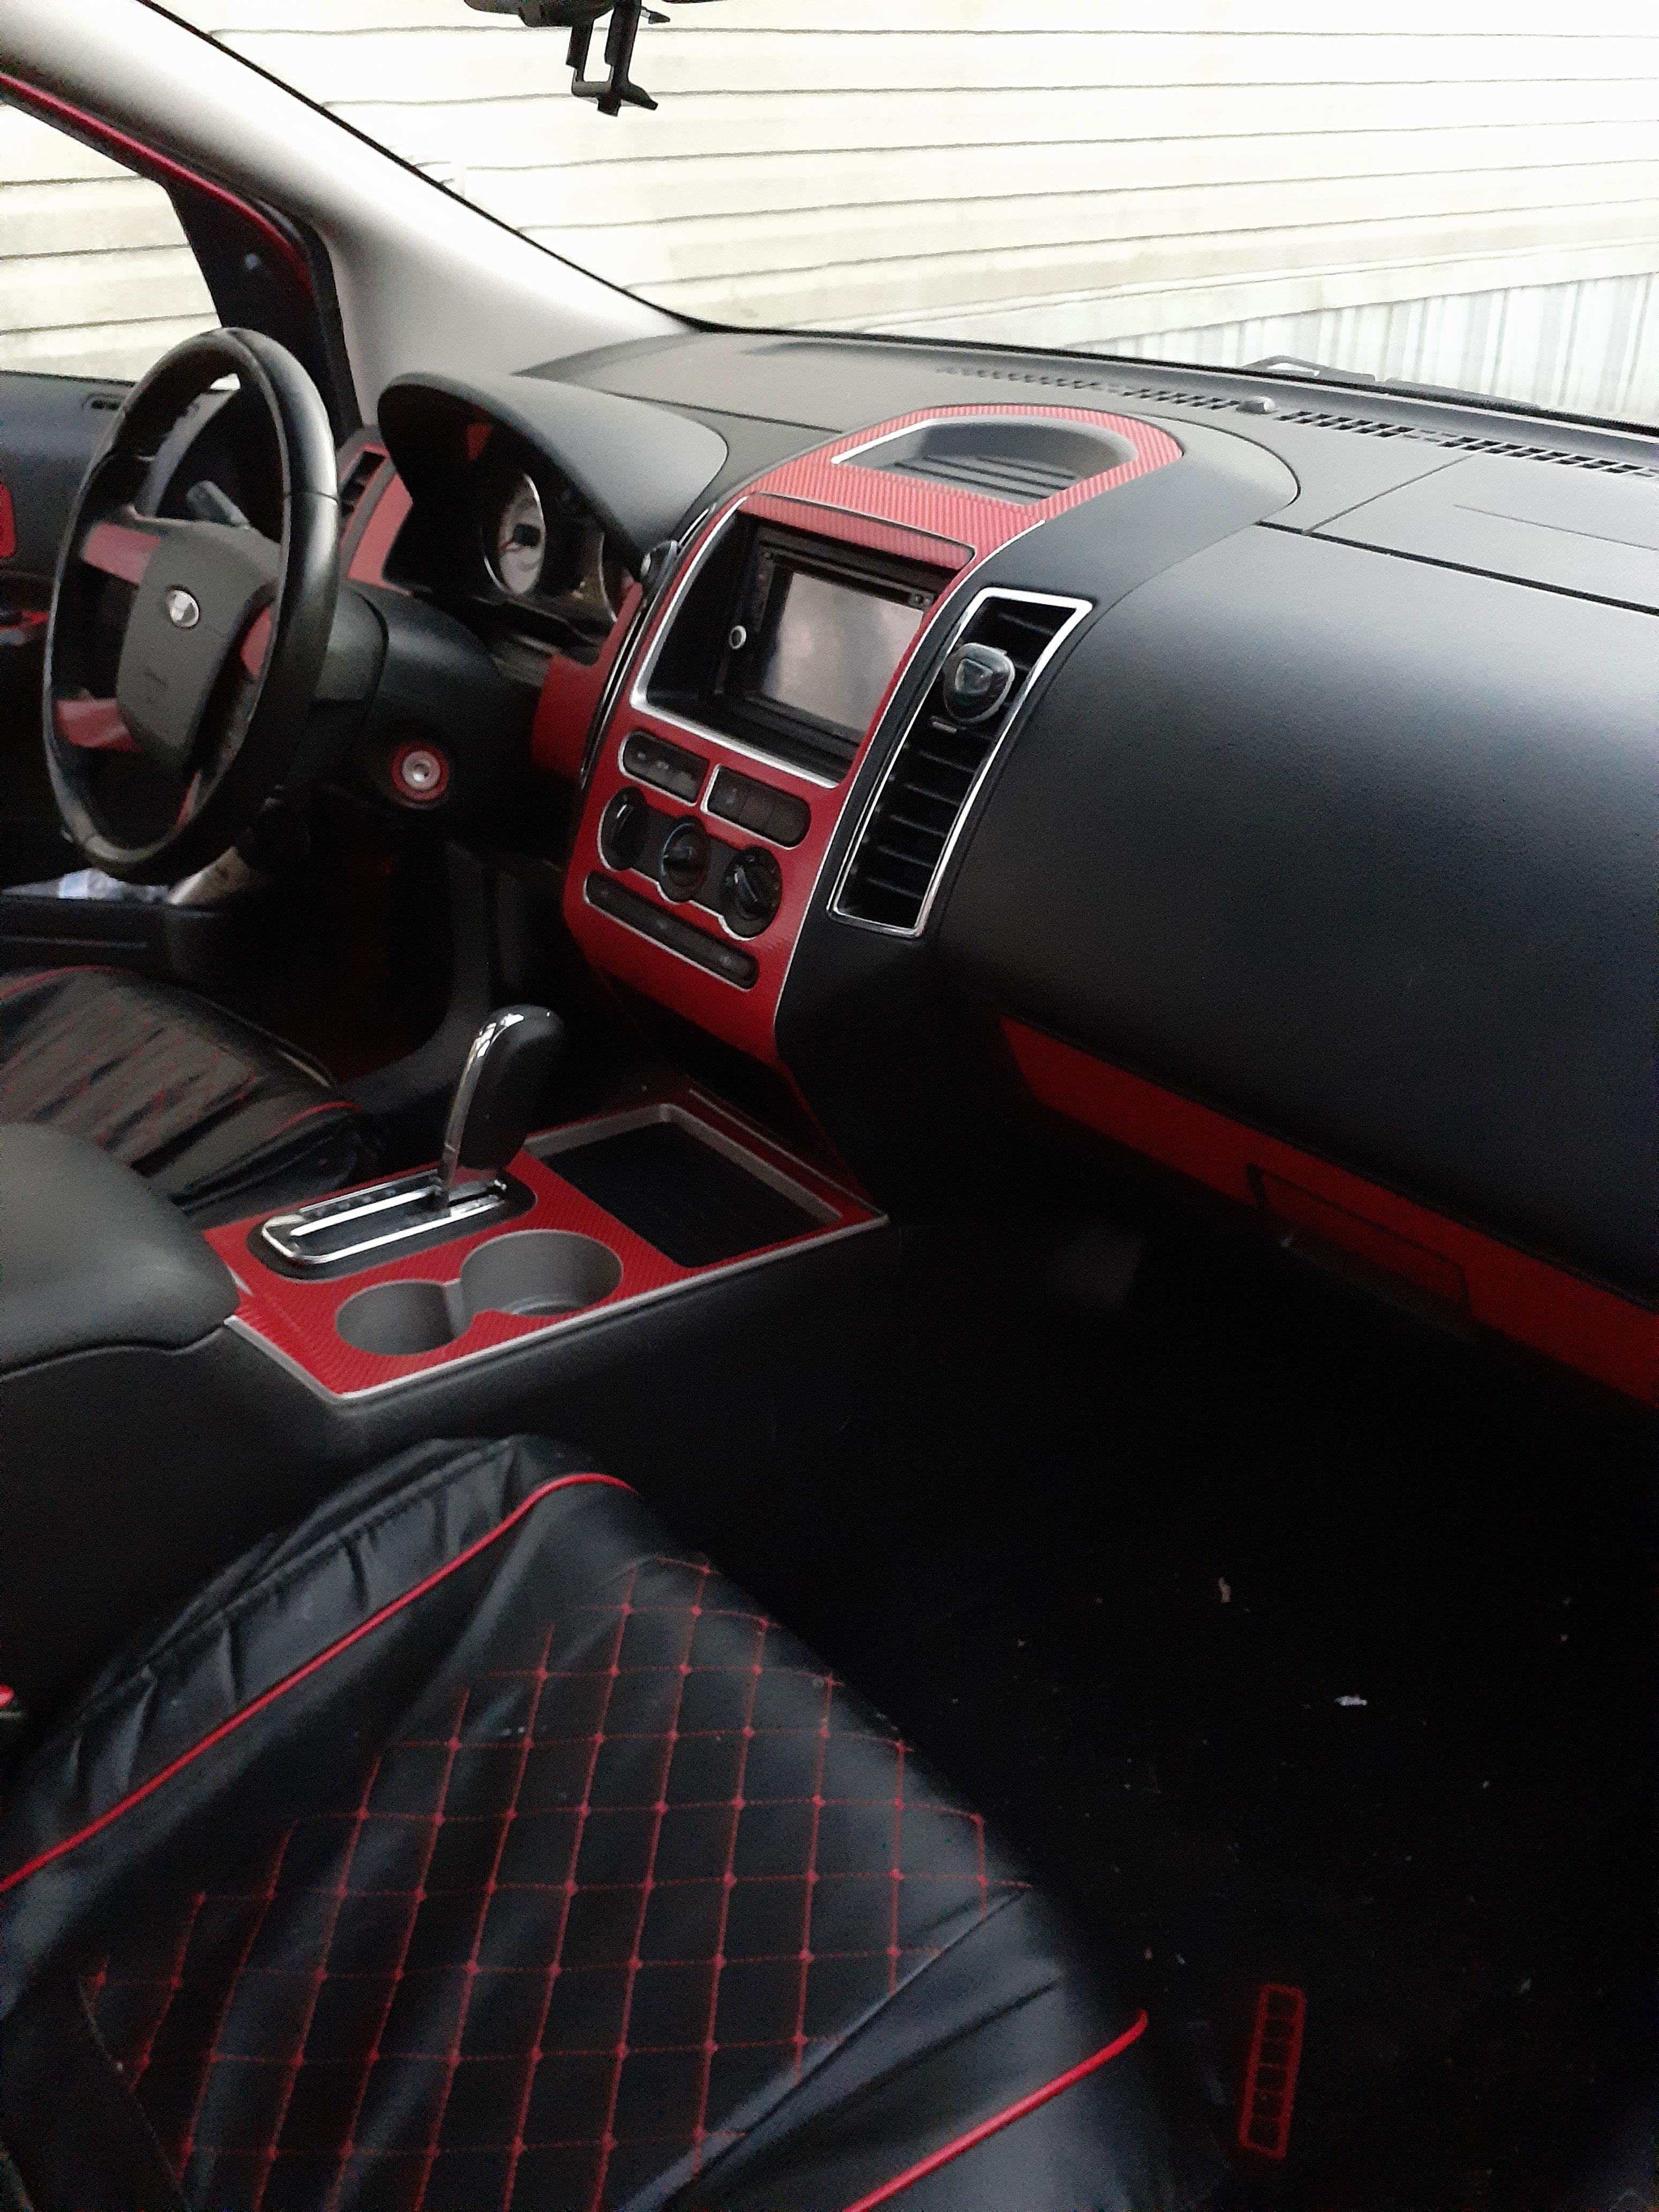 Aluminum Brushed Black Rvinyl Rdash Dash Kit Decal Trim for Ford Edge 2007-2008